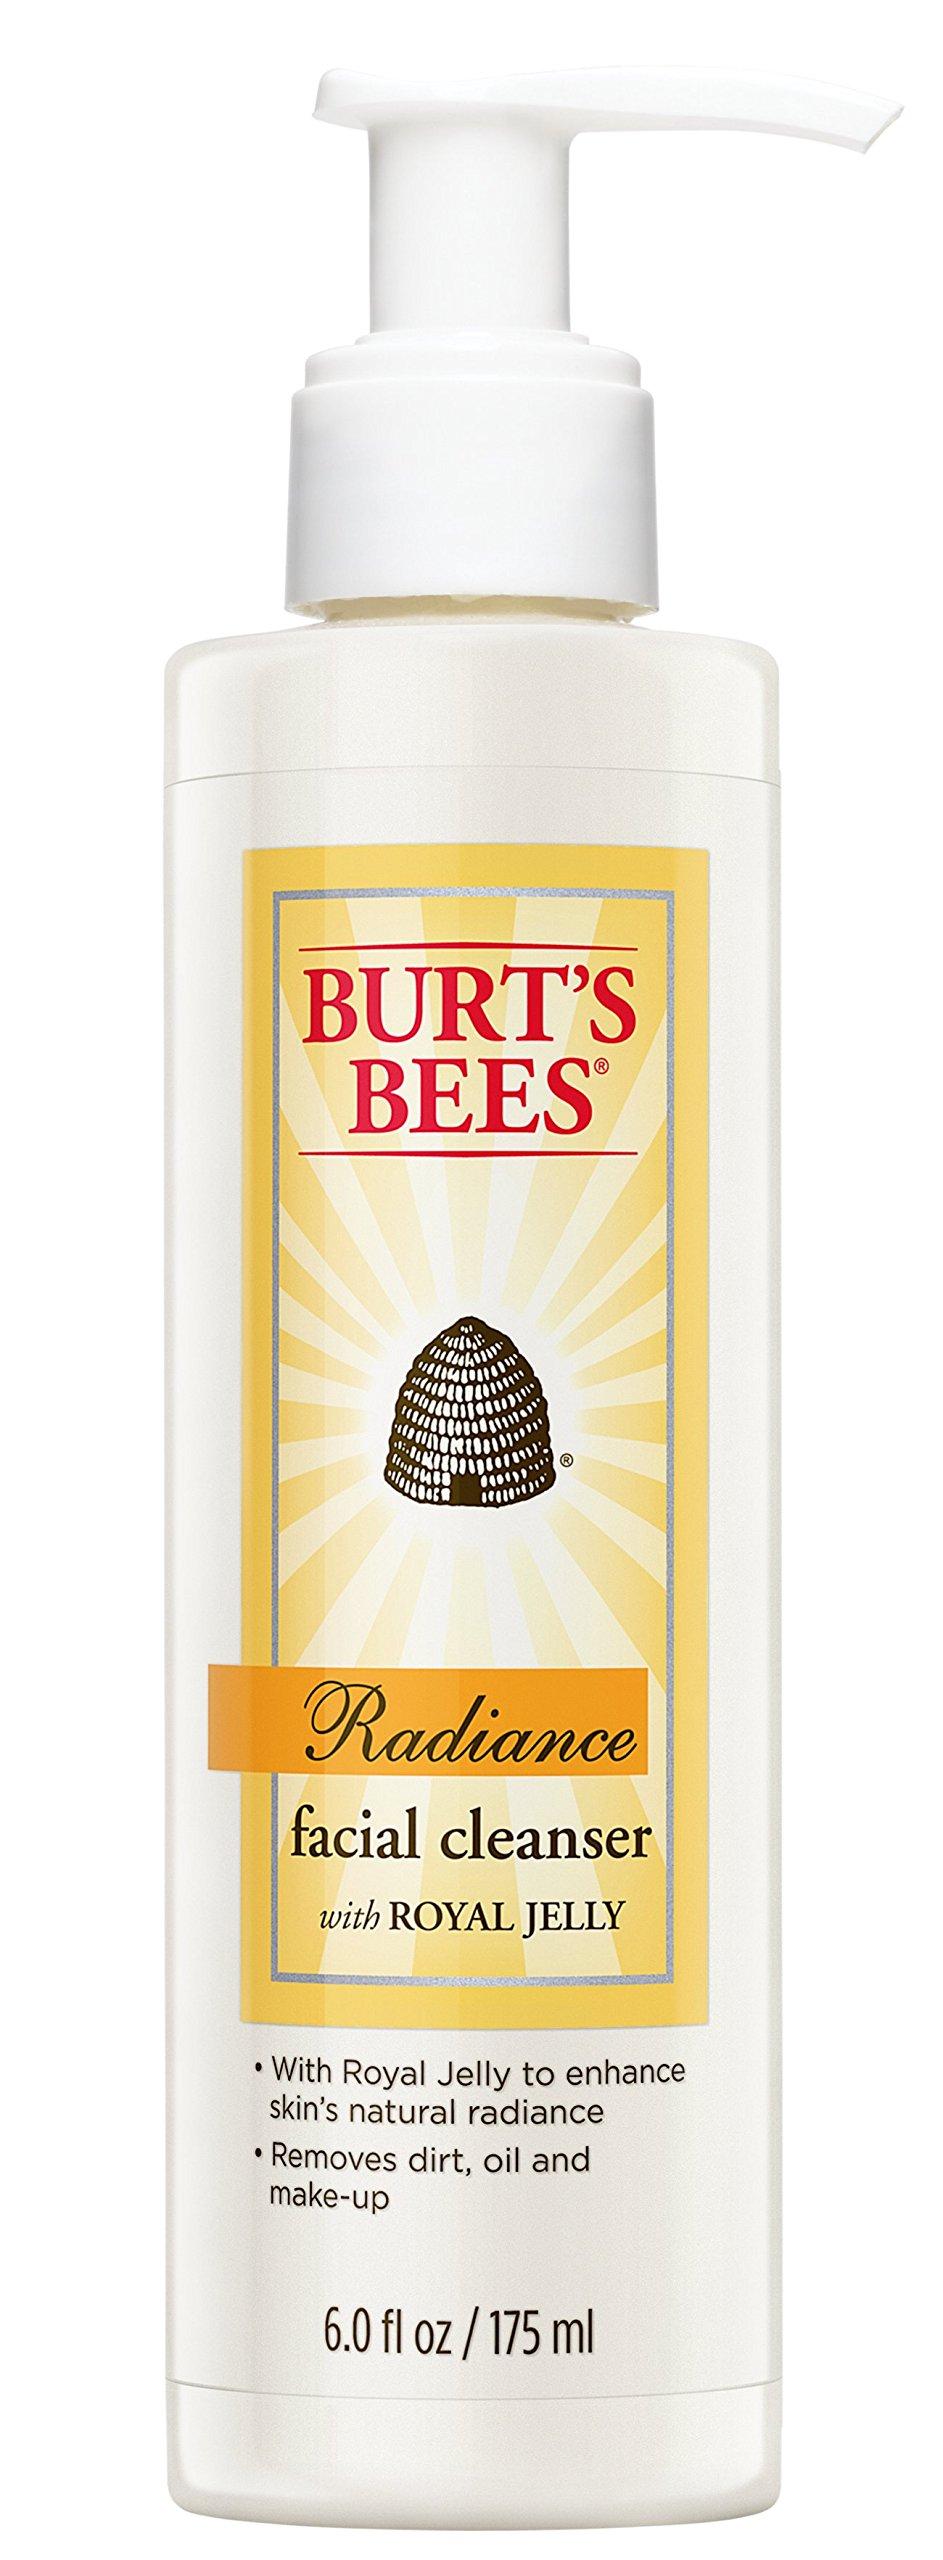 Burt's Bees Radiance Facial Cleanser, 6 Ounces